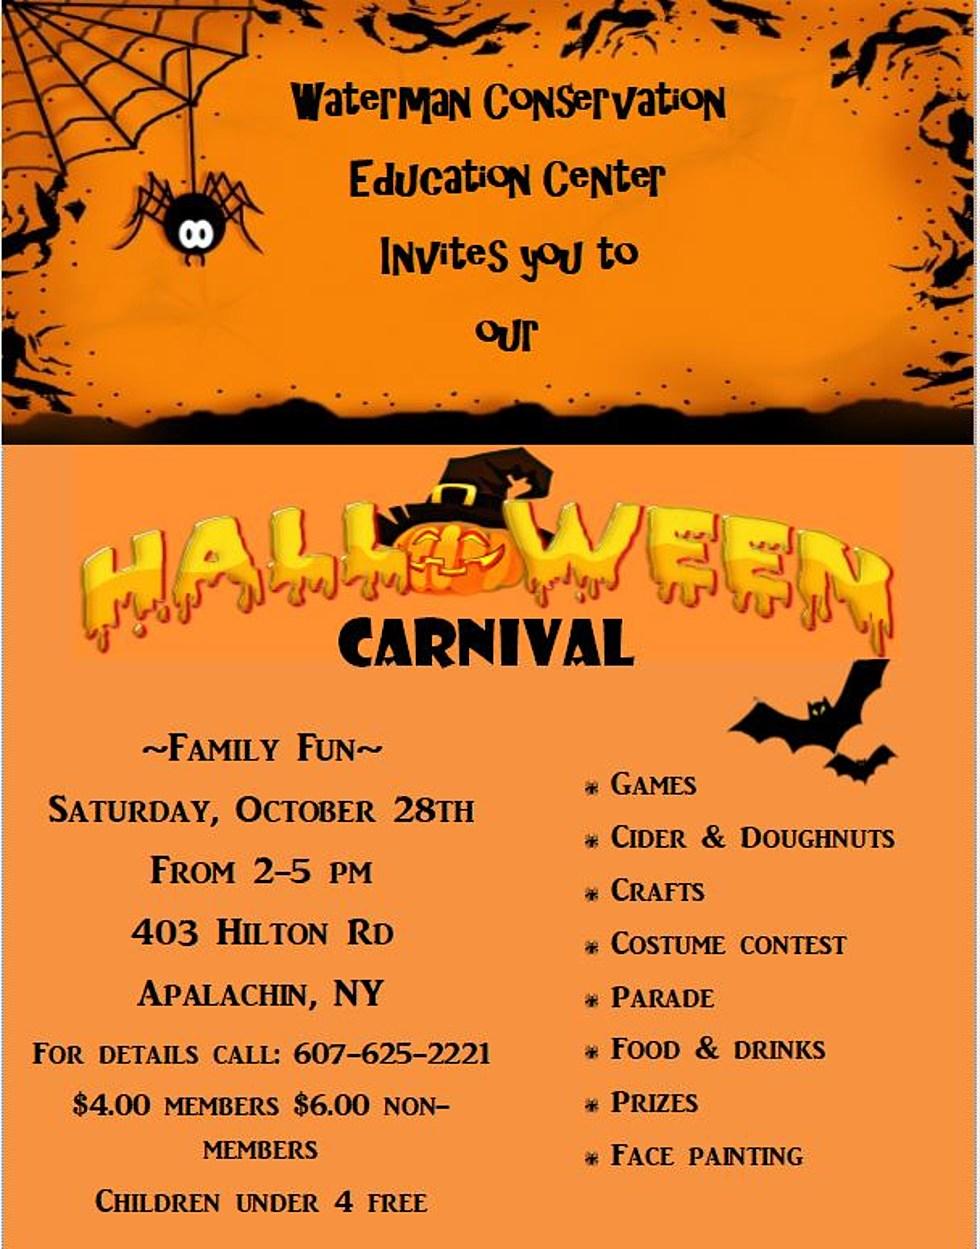 waterman center's halloween carnival